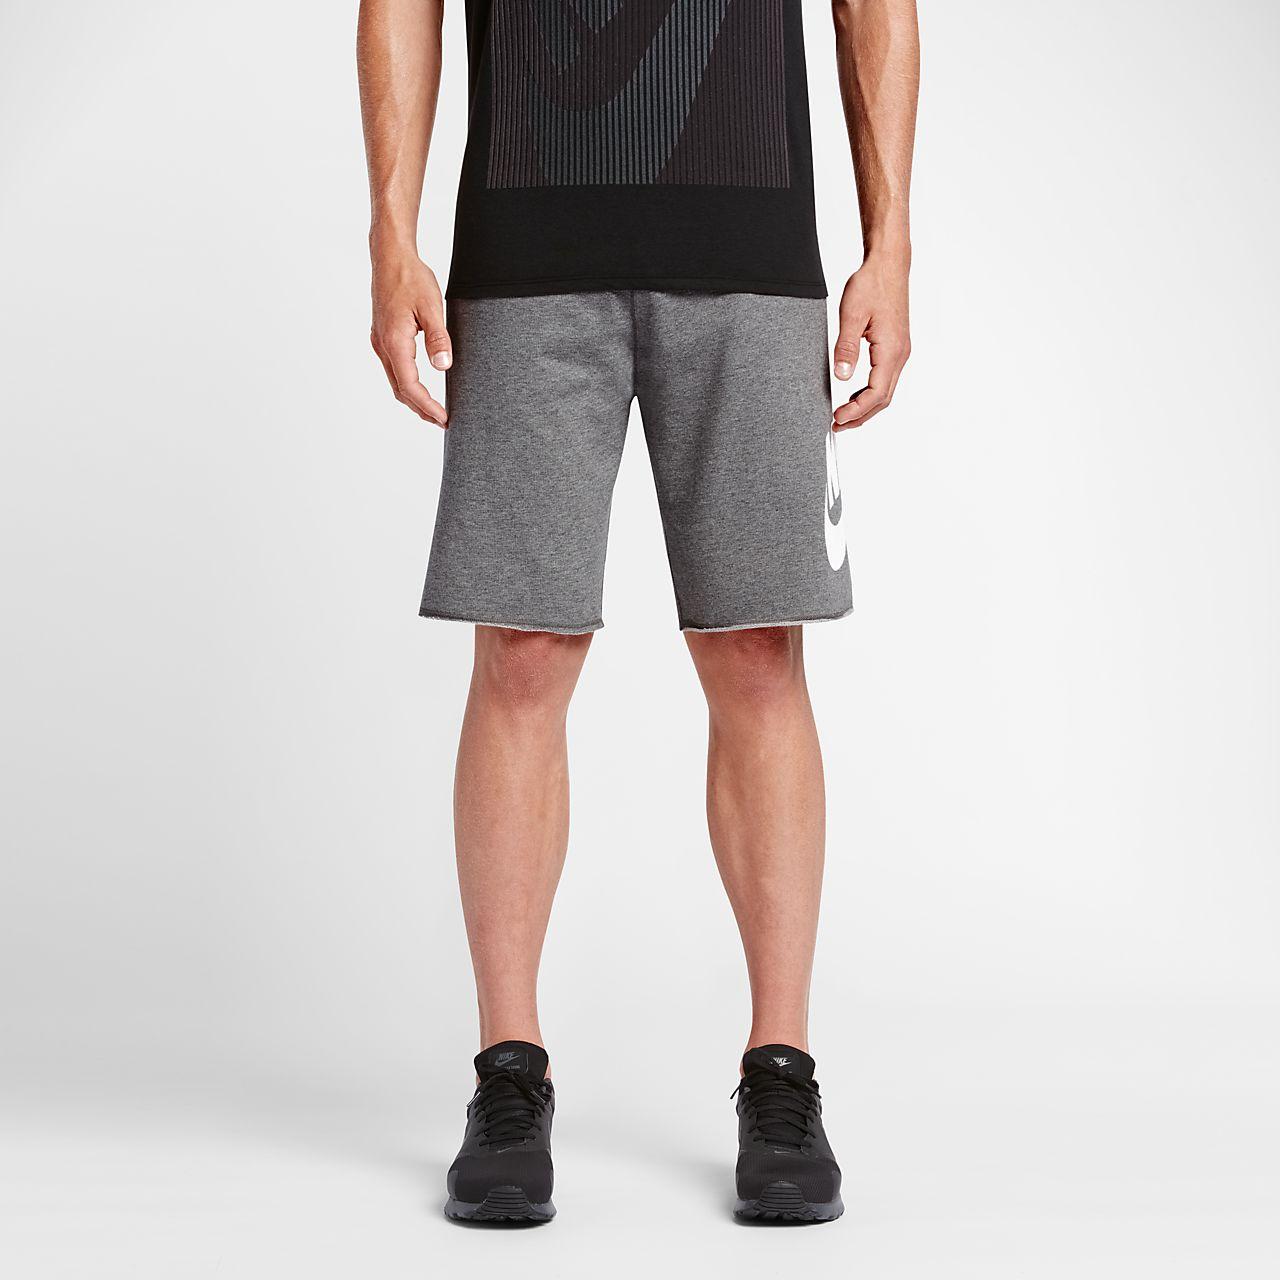 new style 44688 6a9c5 Low Resolution Nike Sportswear Men s Logo Shorts Nike Sportswear Men s Logo  Shorts